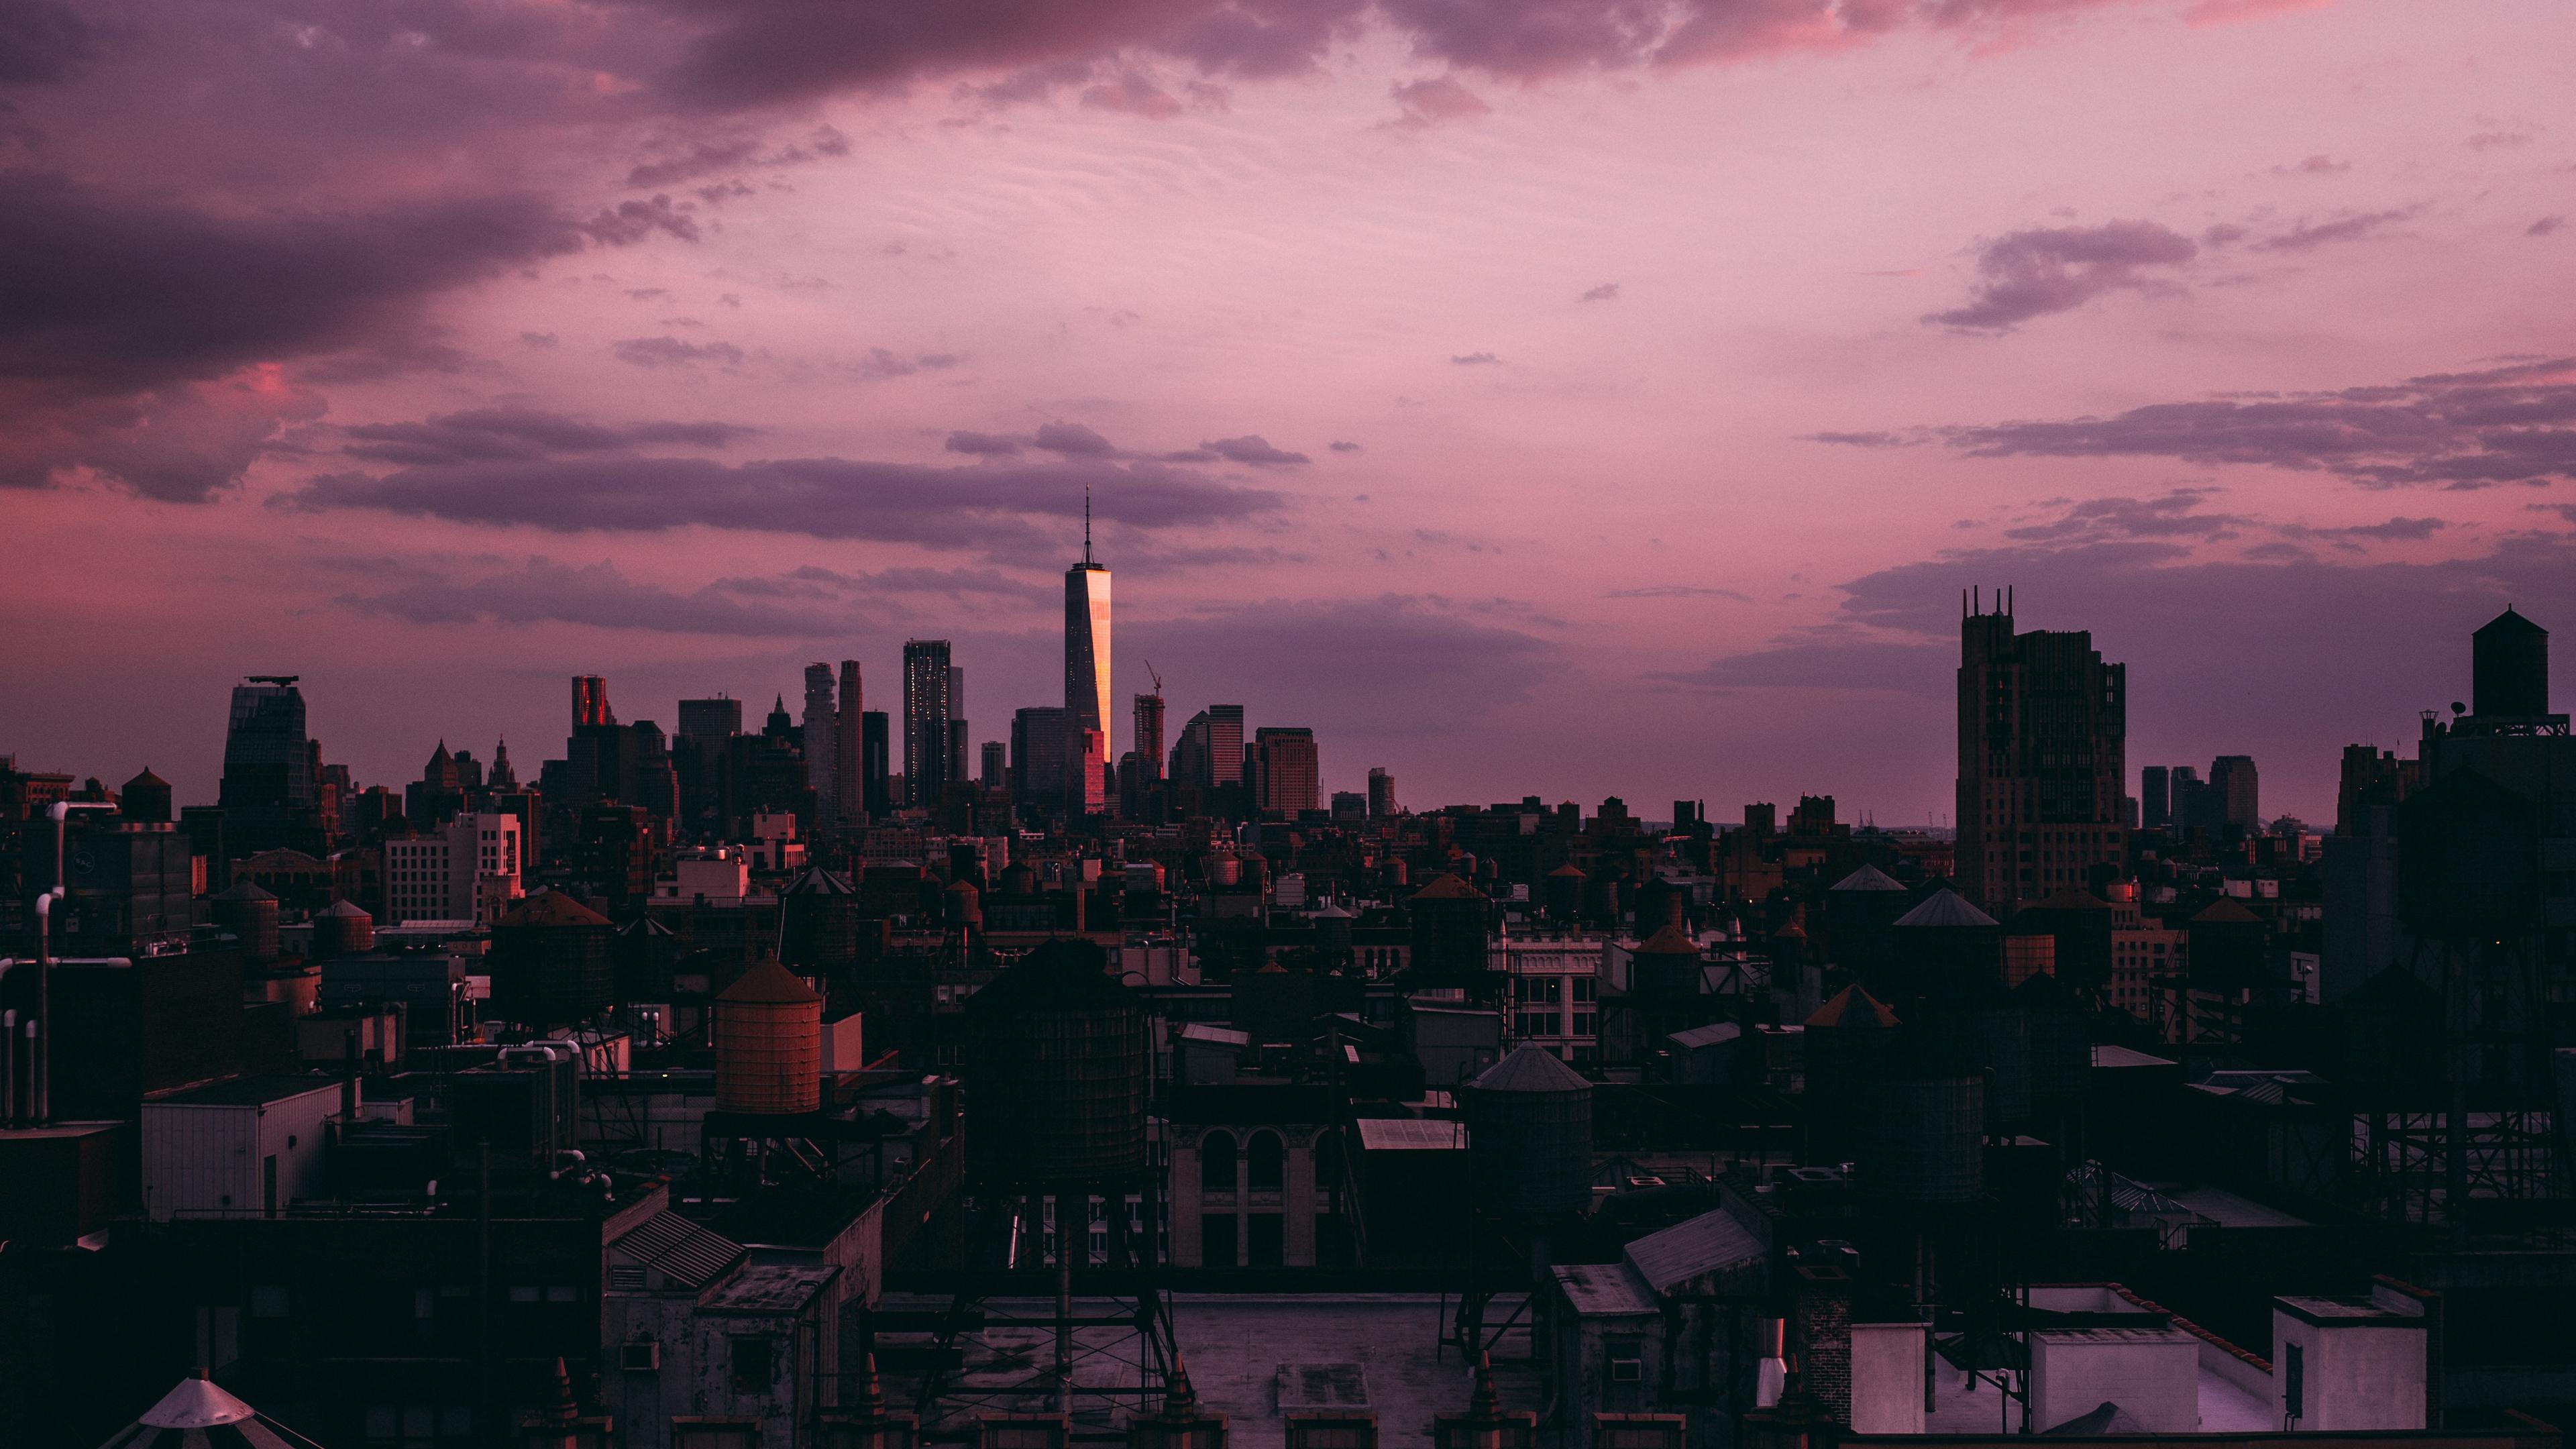 new york skyscrapers sunset clouds usa 4k 1538066267 - new york, skyscrapers, sunset, clouds, usa 4k - sunset, Skyscrapers, new york